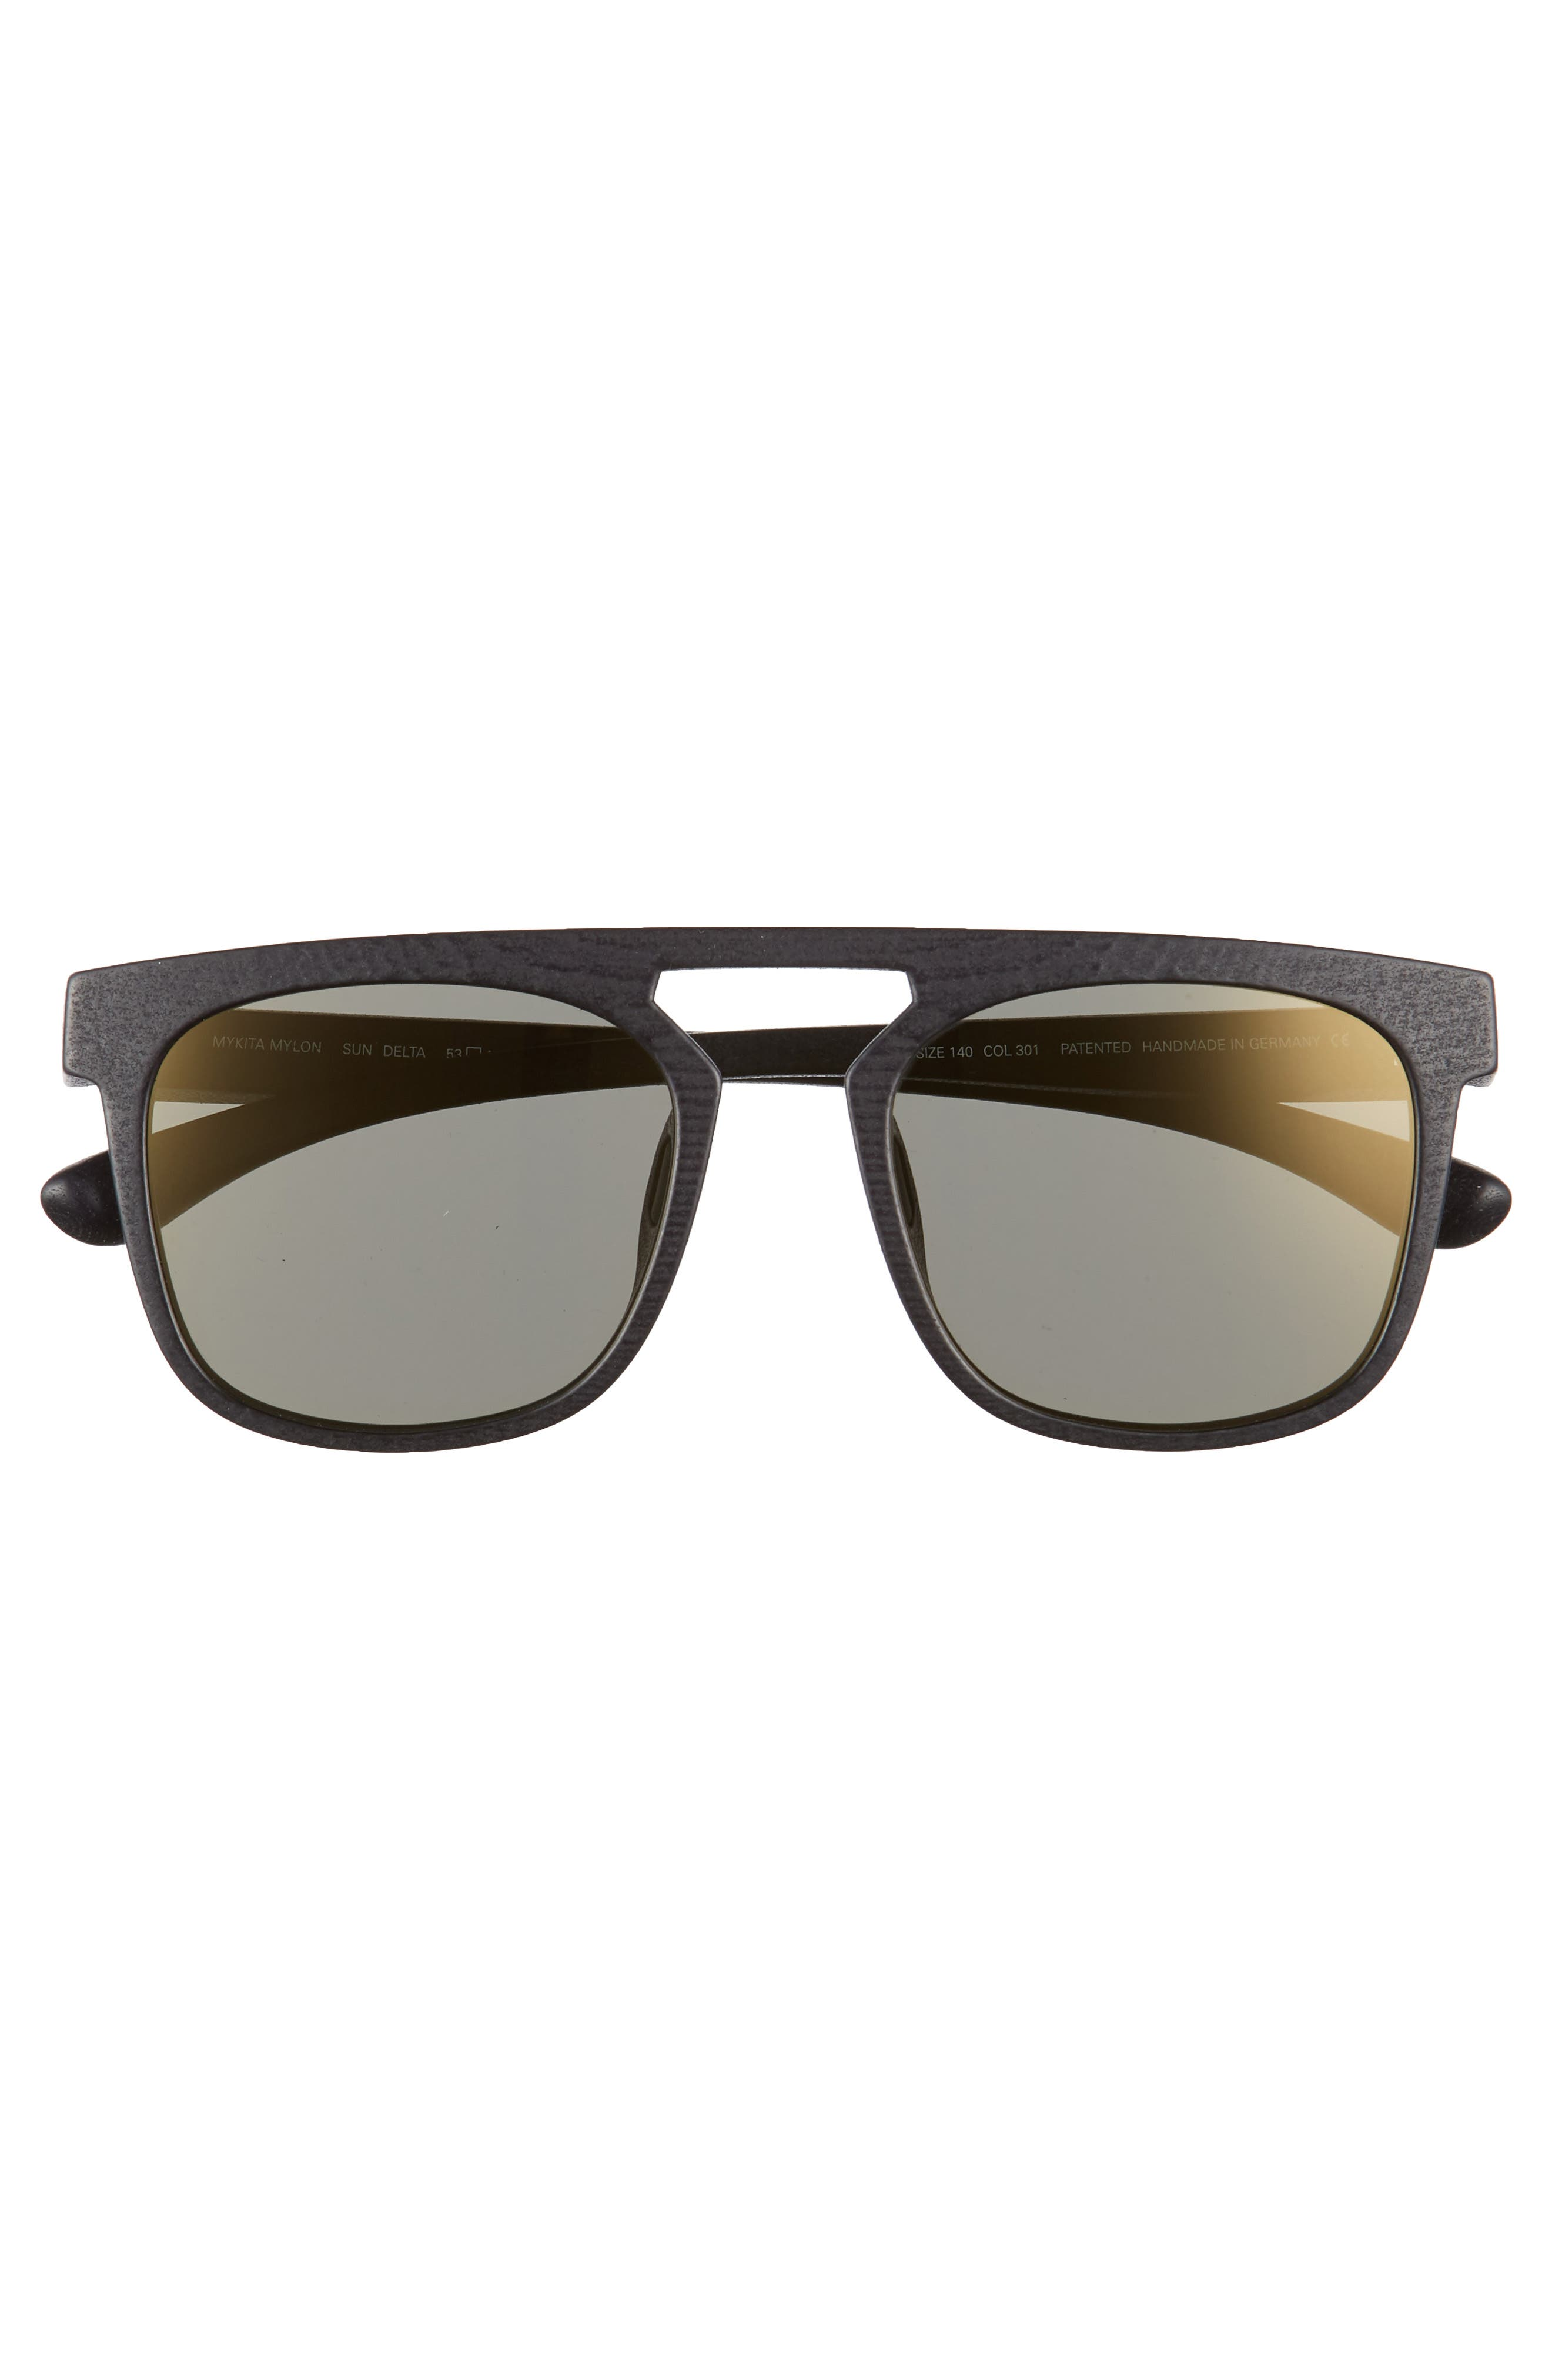 Delta 53mm Sunglasses,                             Alternate thumbnail 2, color,                             Pitch Black